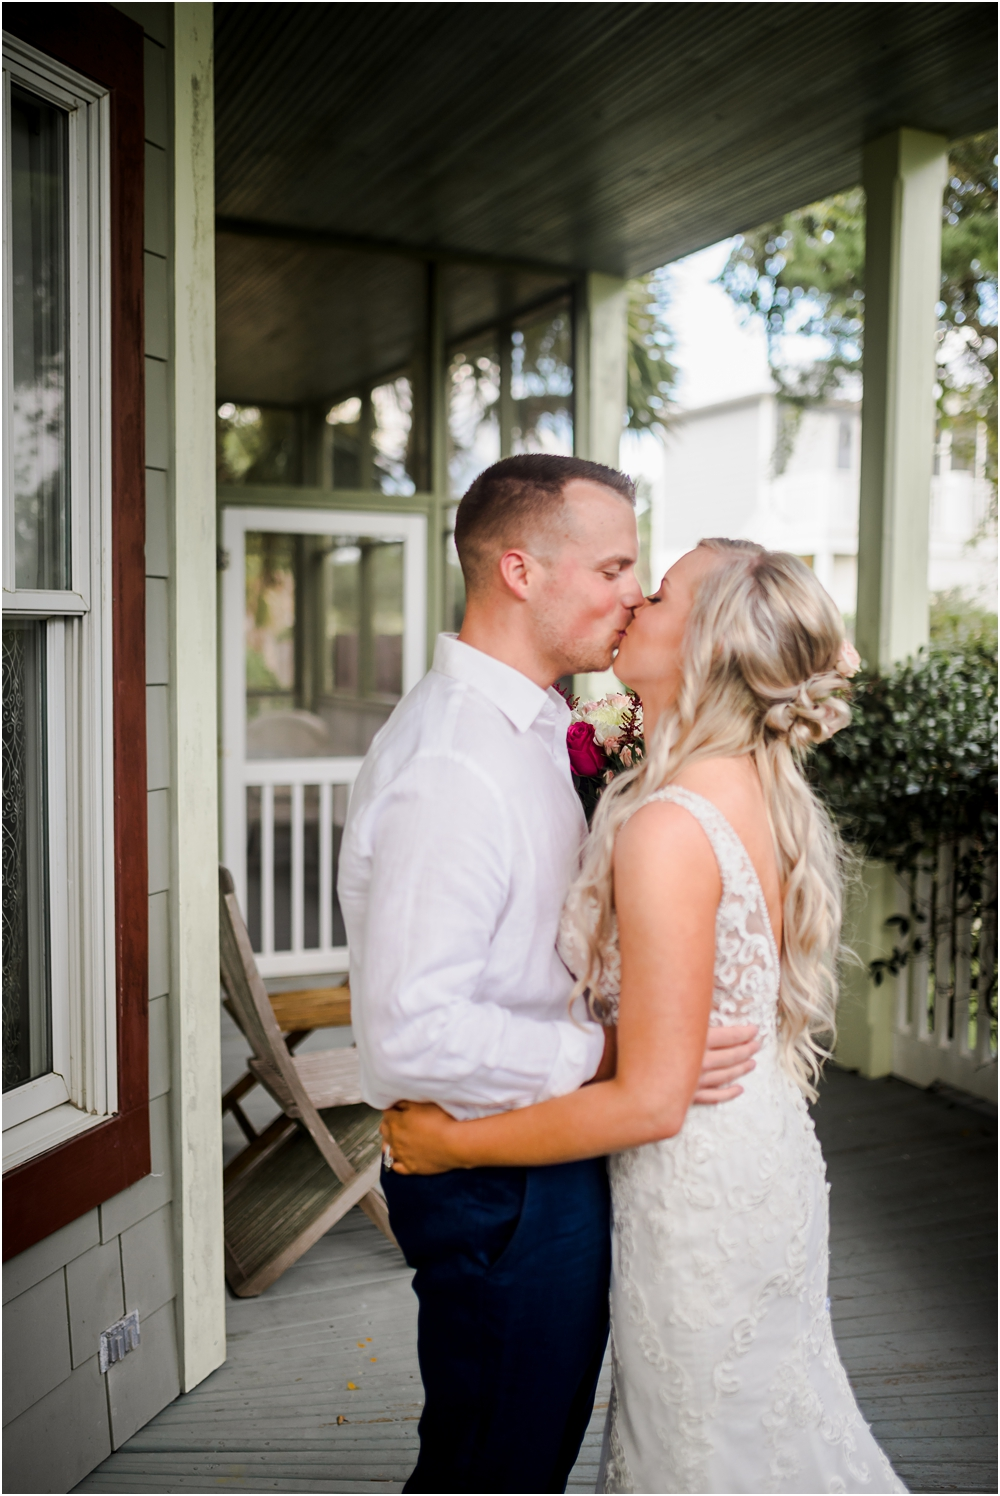 mcglothlin-wedding-kiersten-stevenson-photography-30a-panama-city-beach-dothan-tallahassee-(50-of-145).jpg